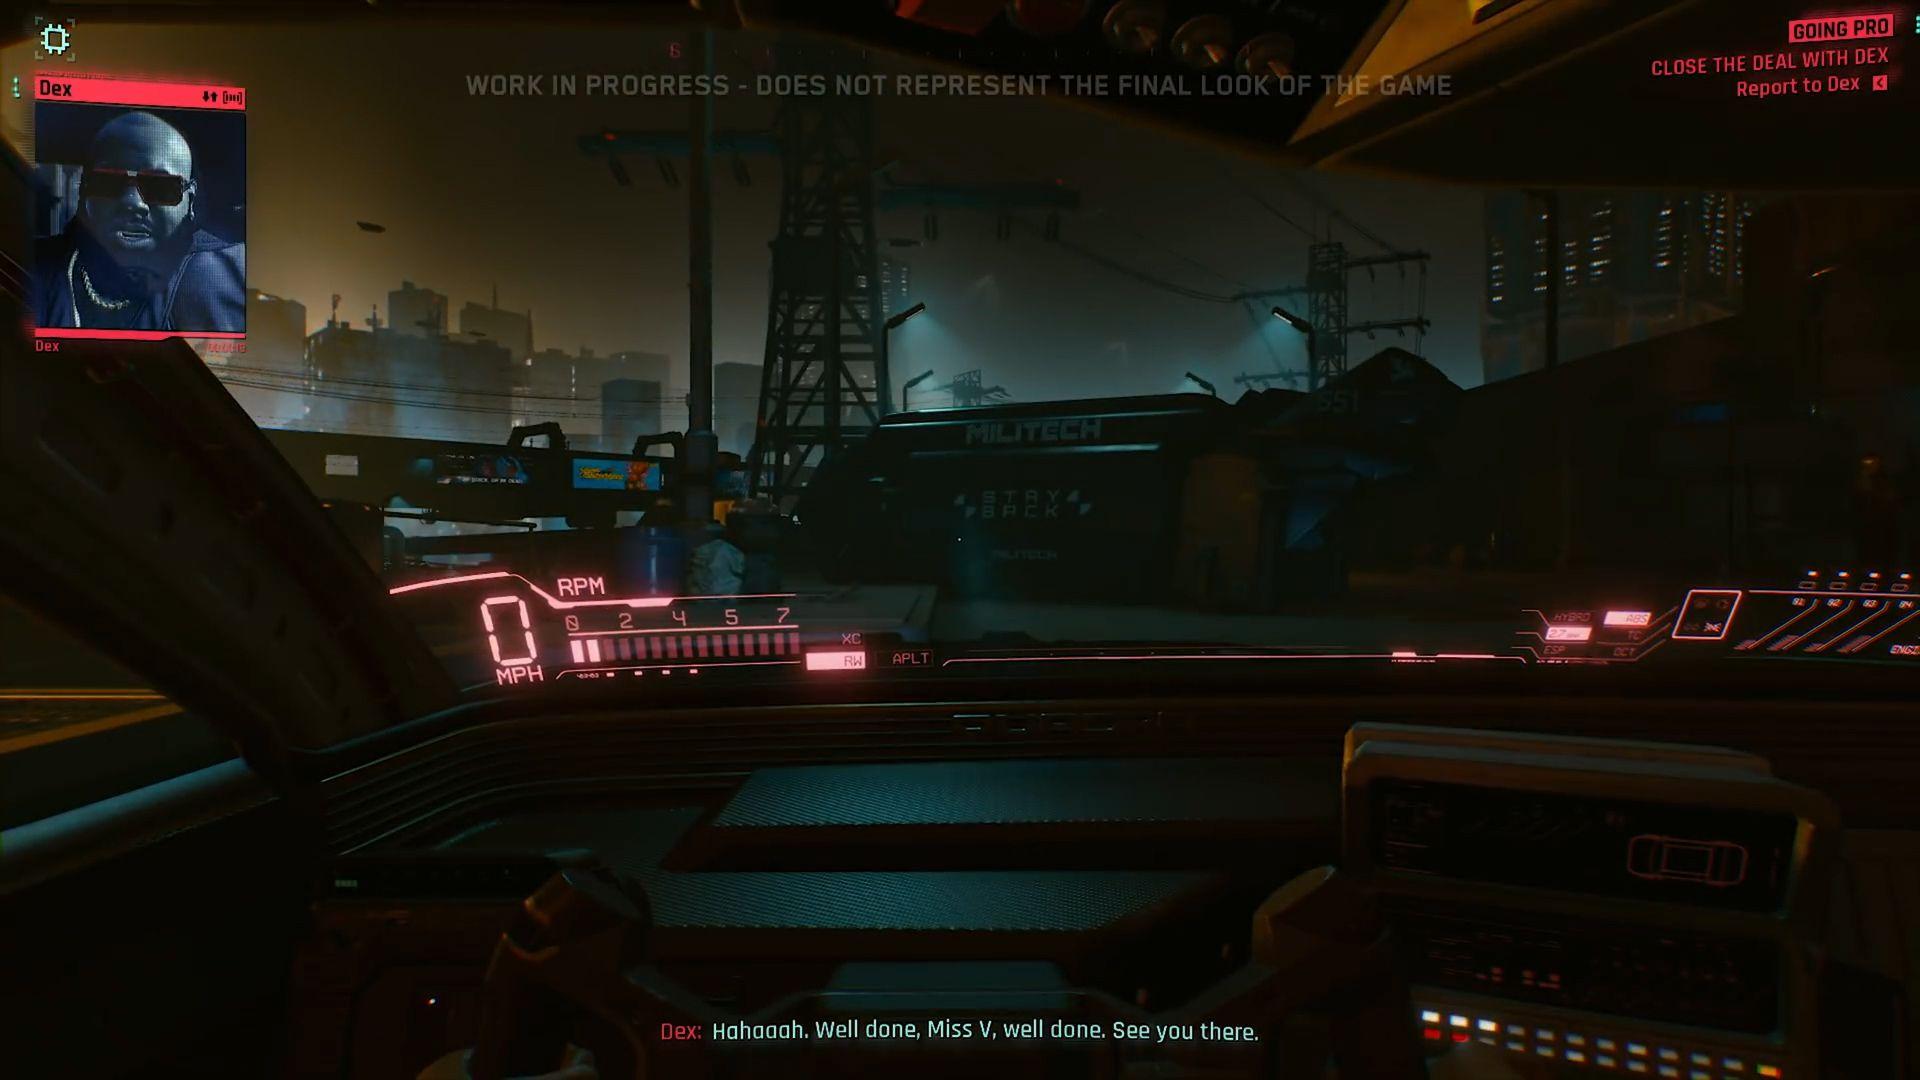 Cyberpunk 2077 looks amazing at night